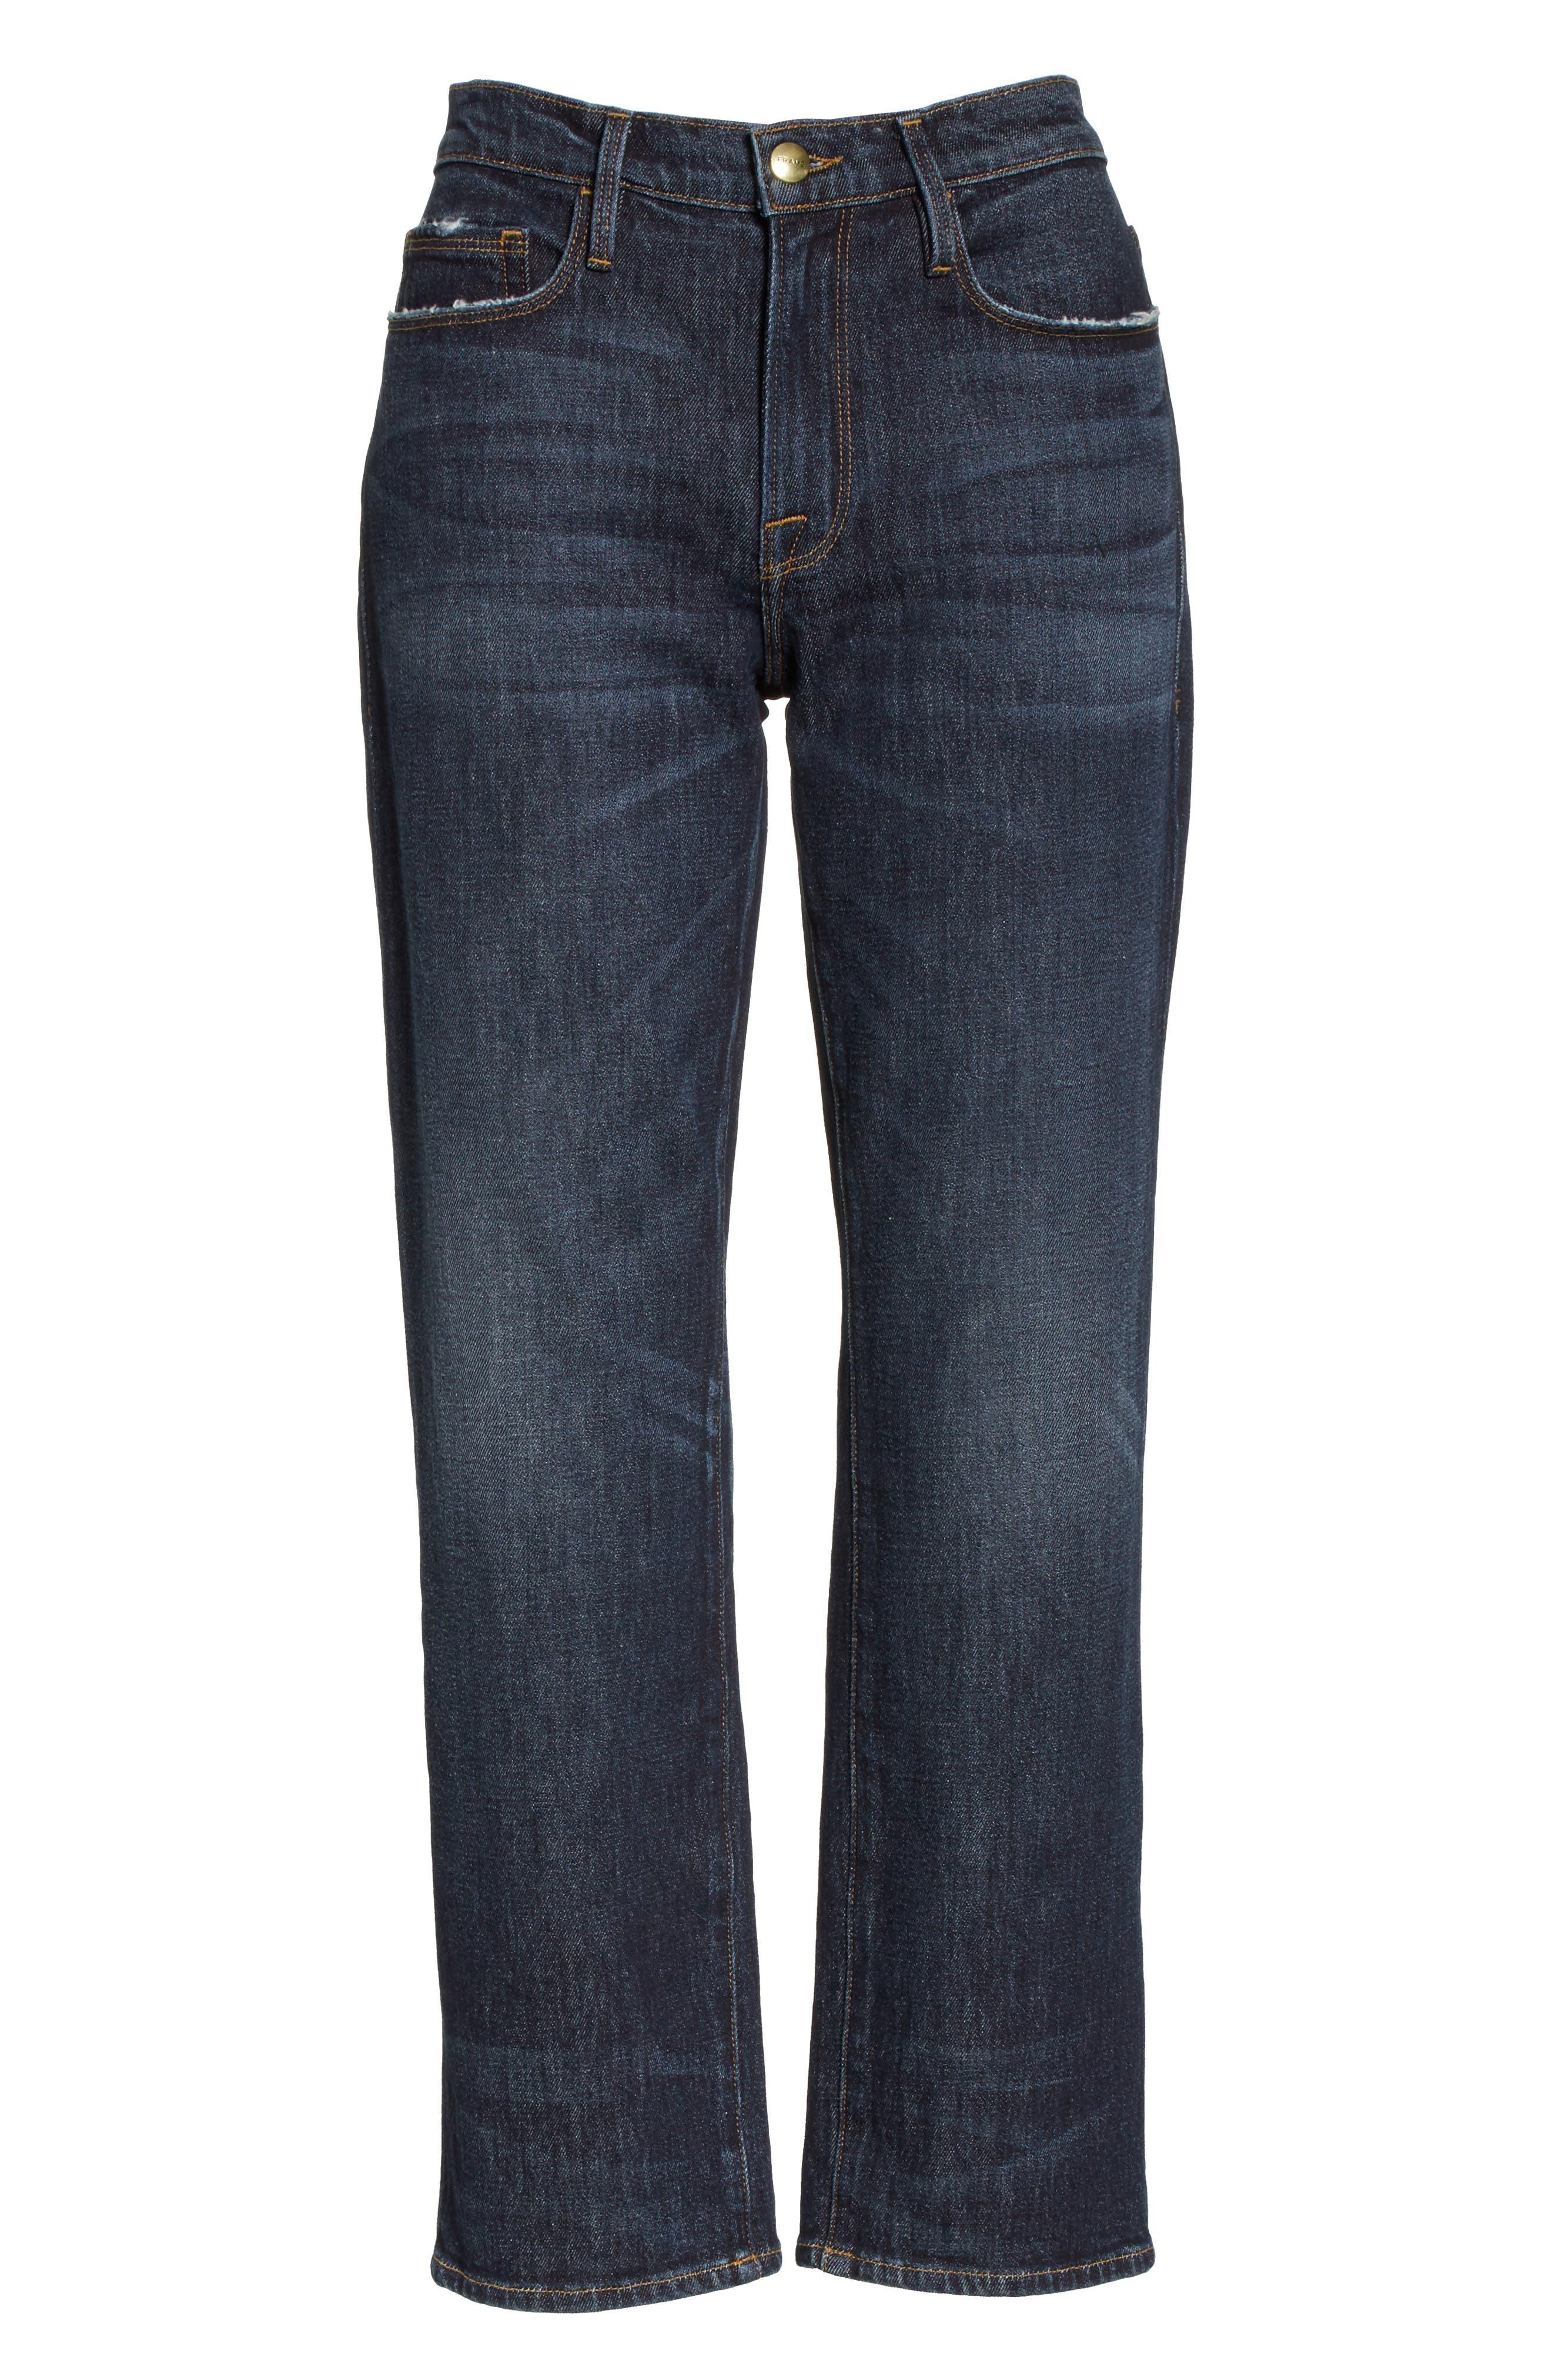 Straight Leg Ankle Jeans,                             Alternate thumbnail 8, color,                             Ellisfield